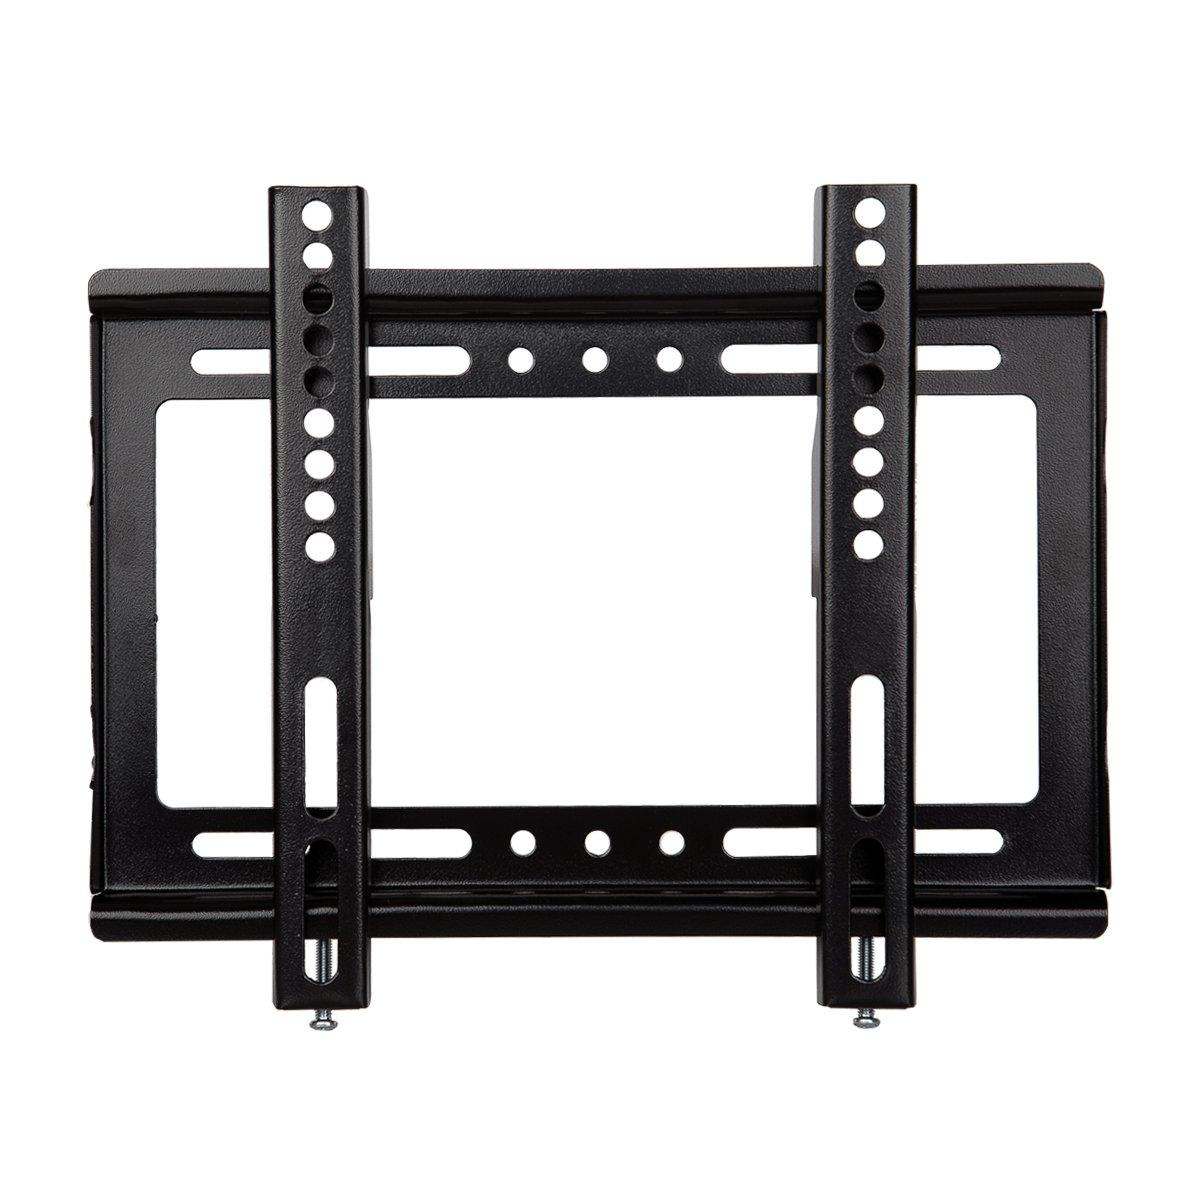 Ultra Slim Fixed Computer TV Wall Mount JinNiu 15-42 inch LCD LED 3D Plasma TV up to VESA 200x200mm and 55lbs Max Load